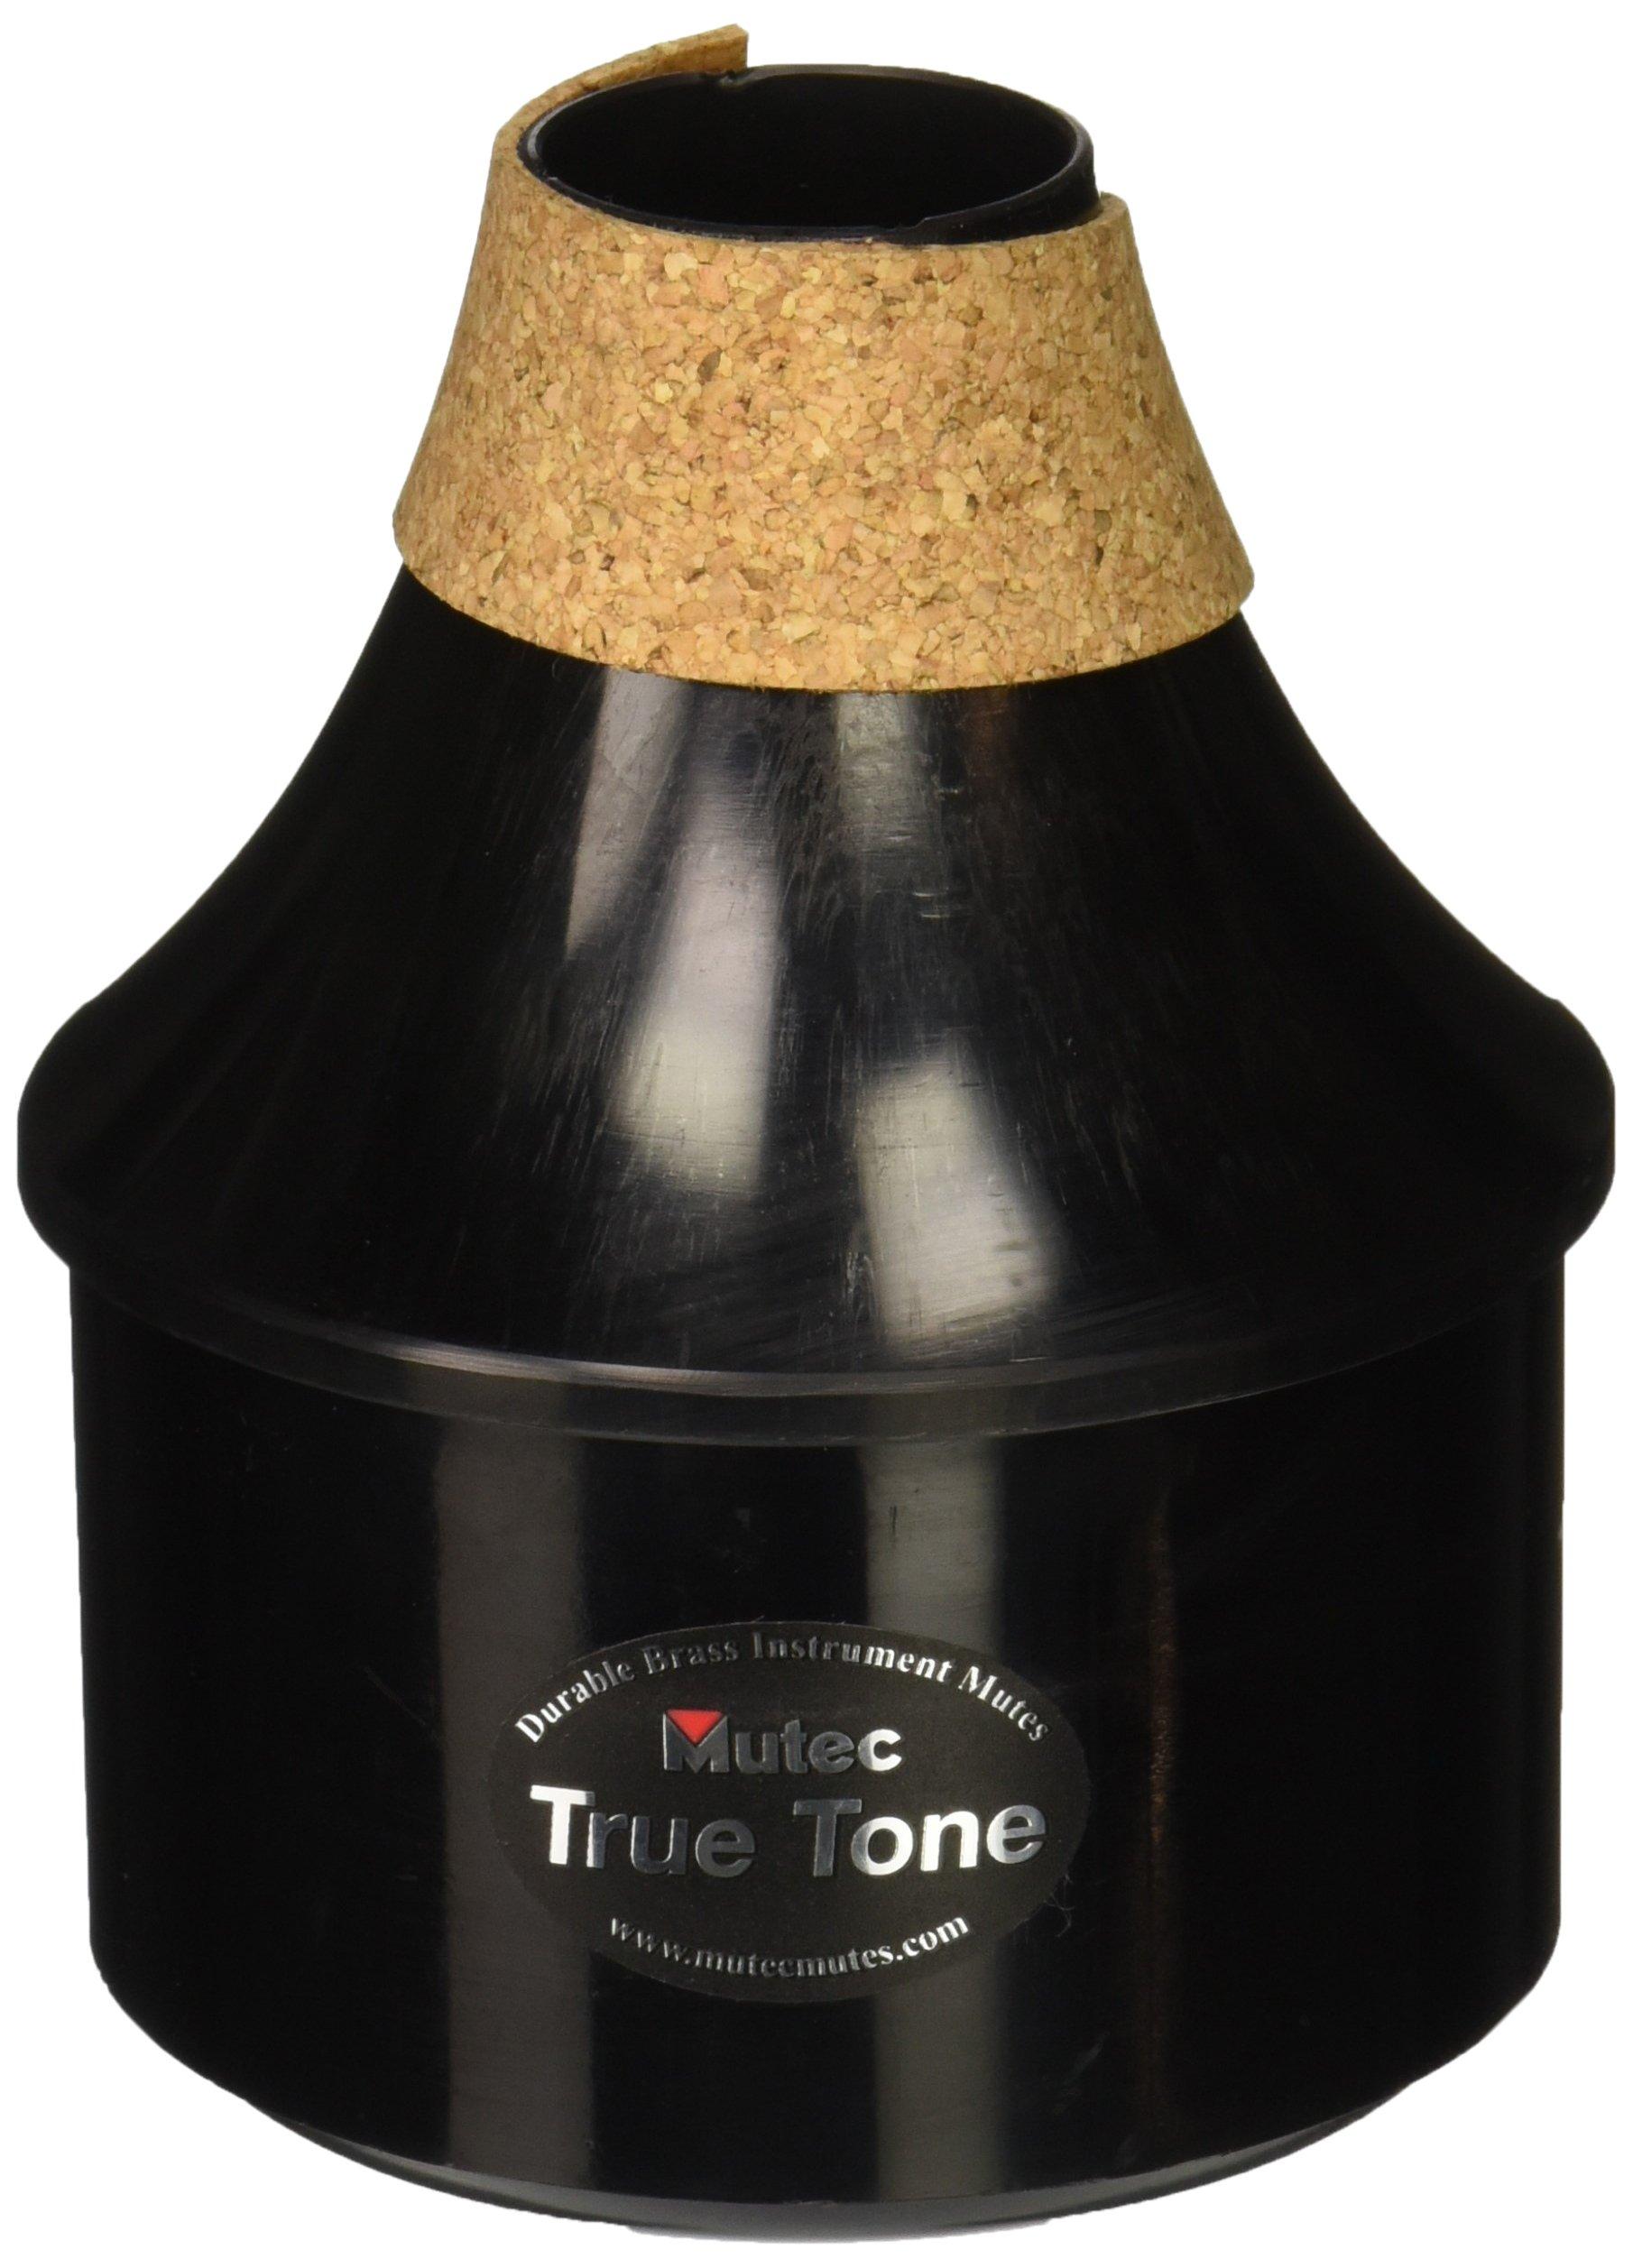 Mutec TrueTone MHT162 Trumpet Mute